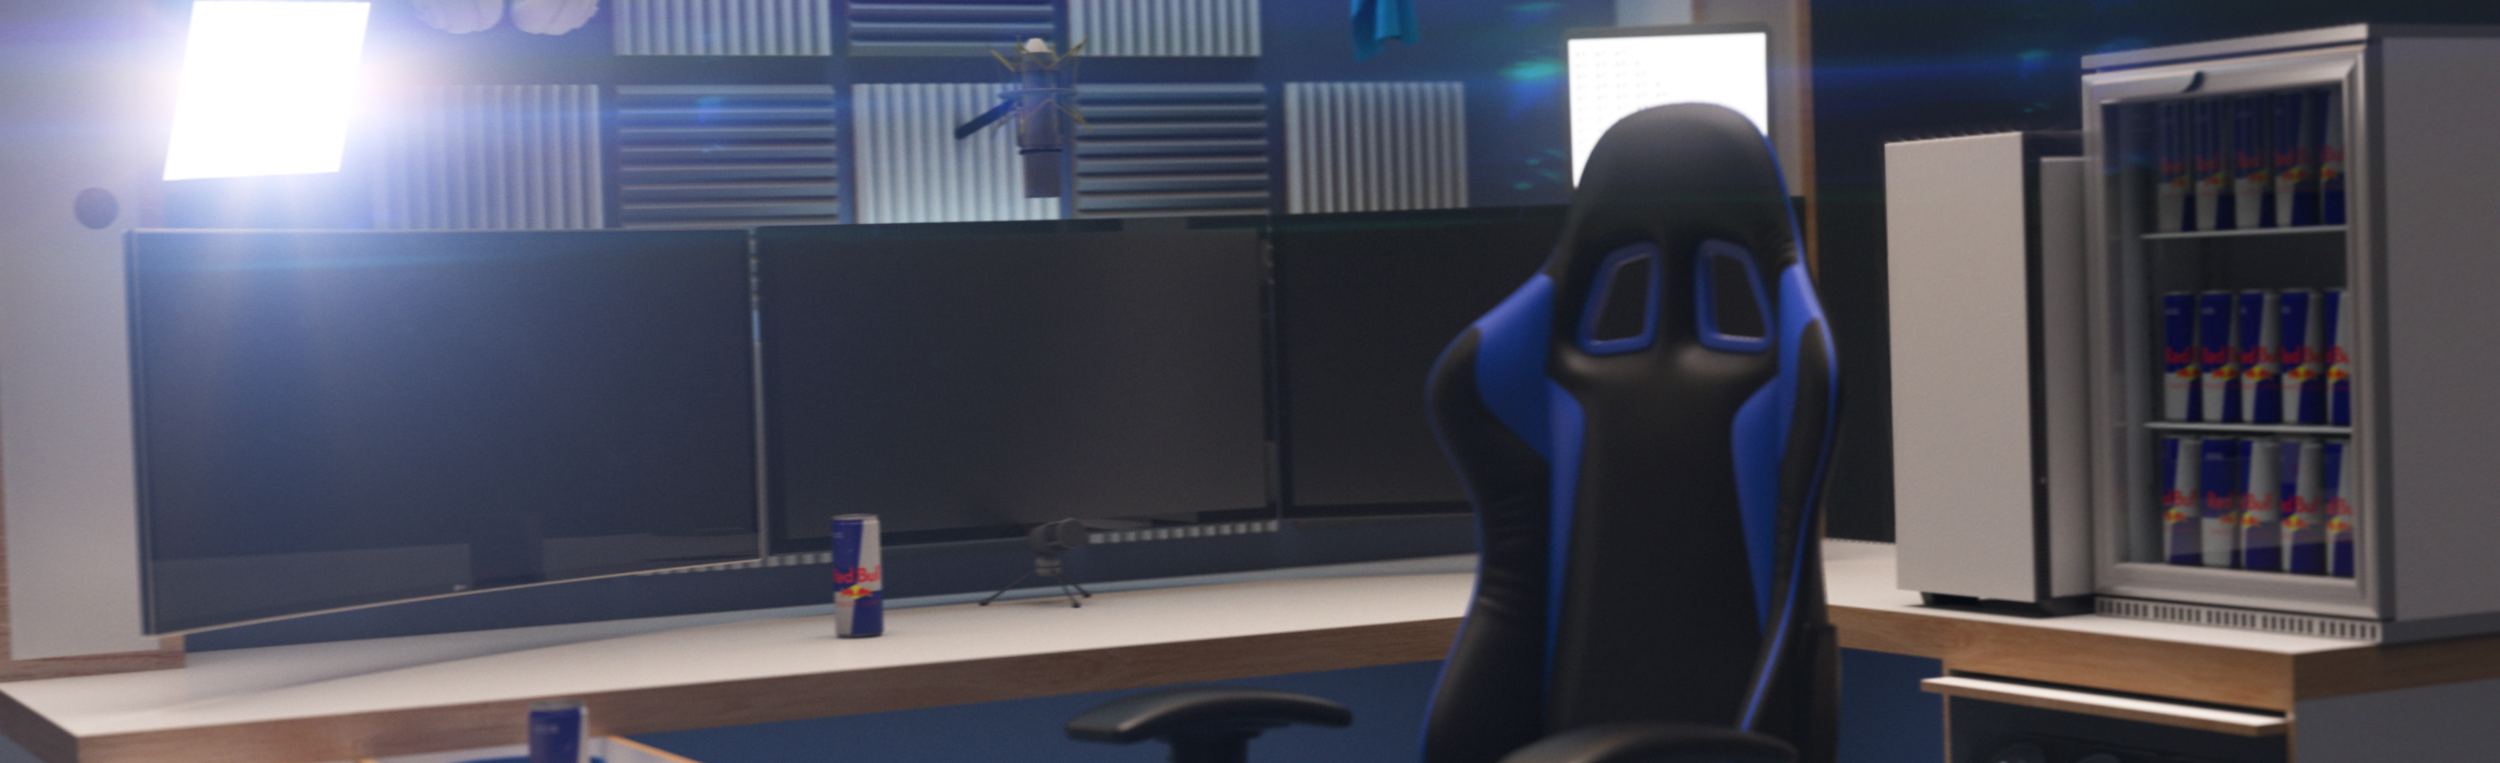 SOKRISPYMEDIA visual effects Twitch Streamer Ninja Redbull Room by Sam Wickert 3